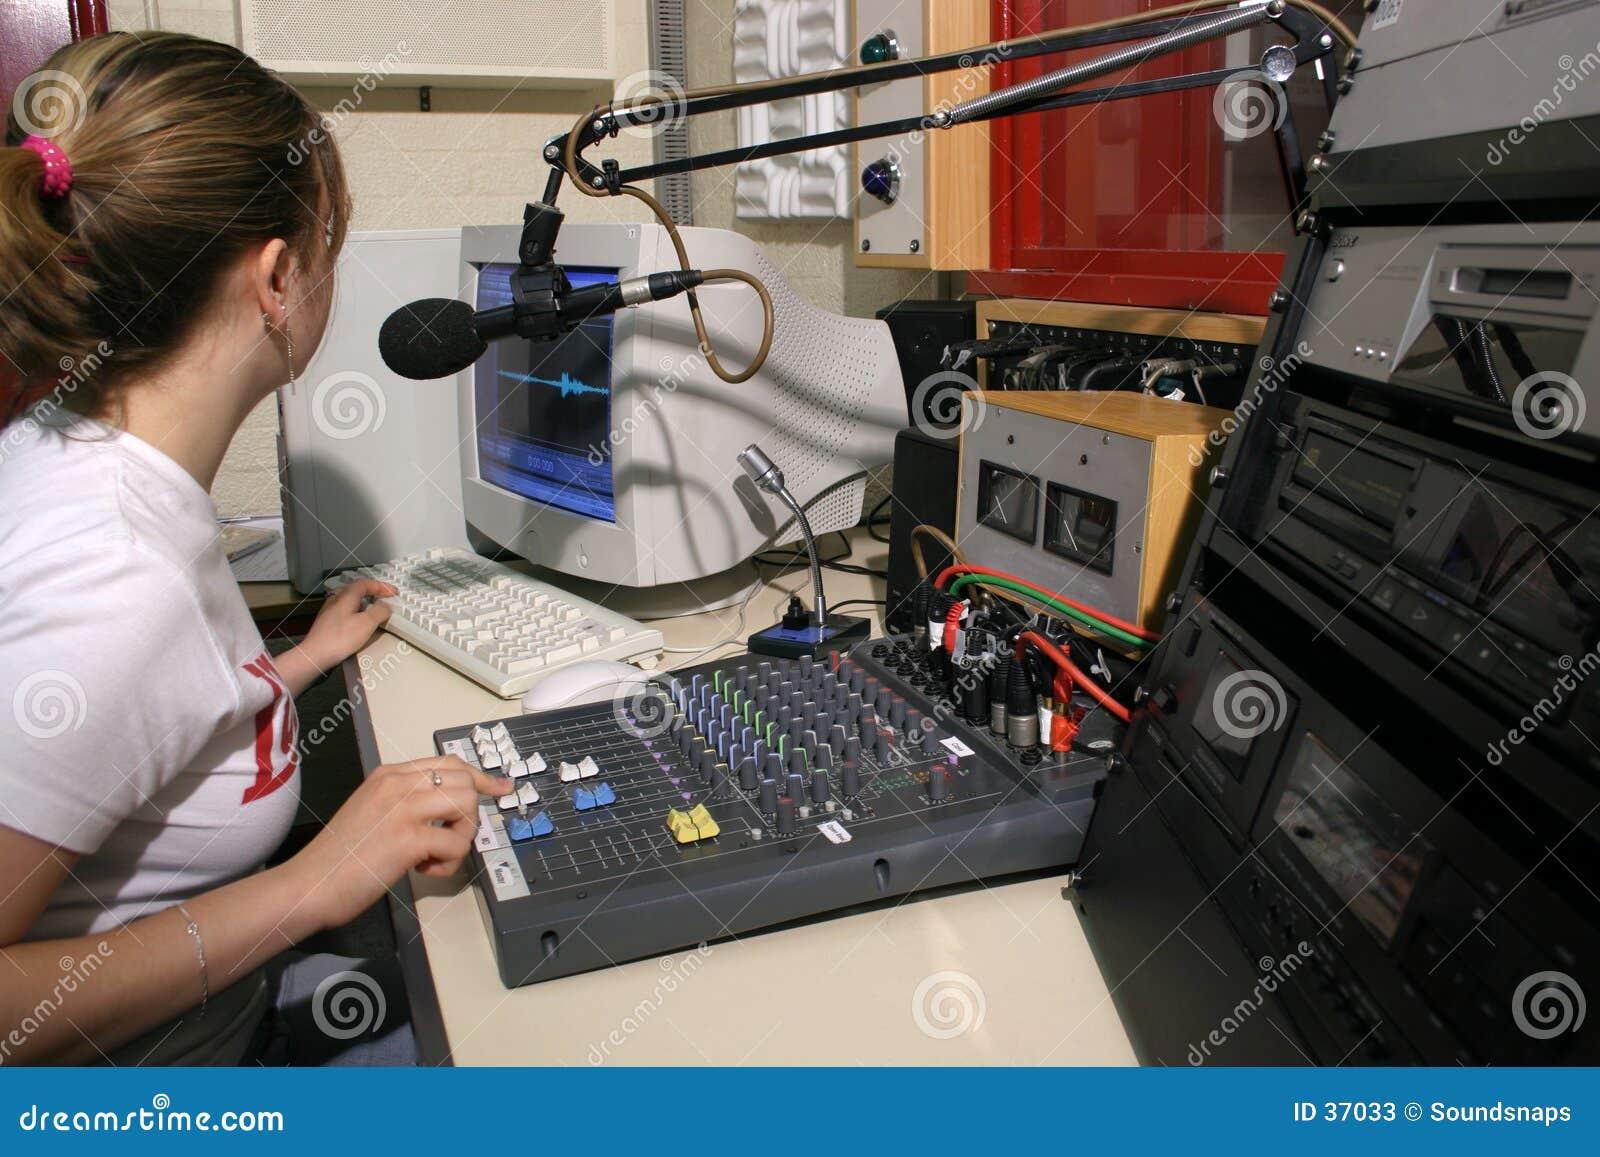 Radiostudio auf Luft